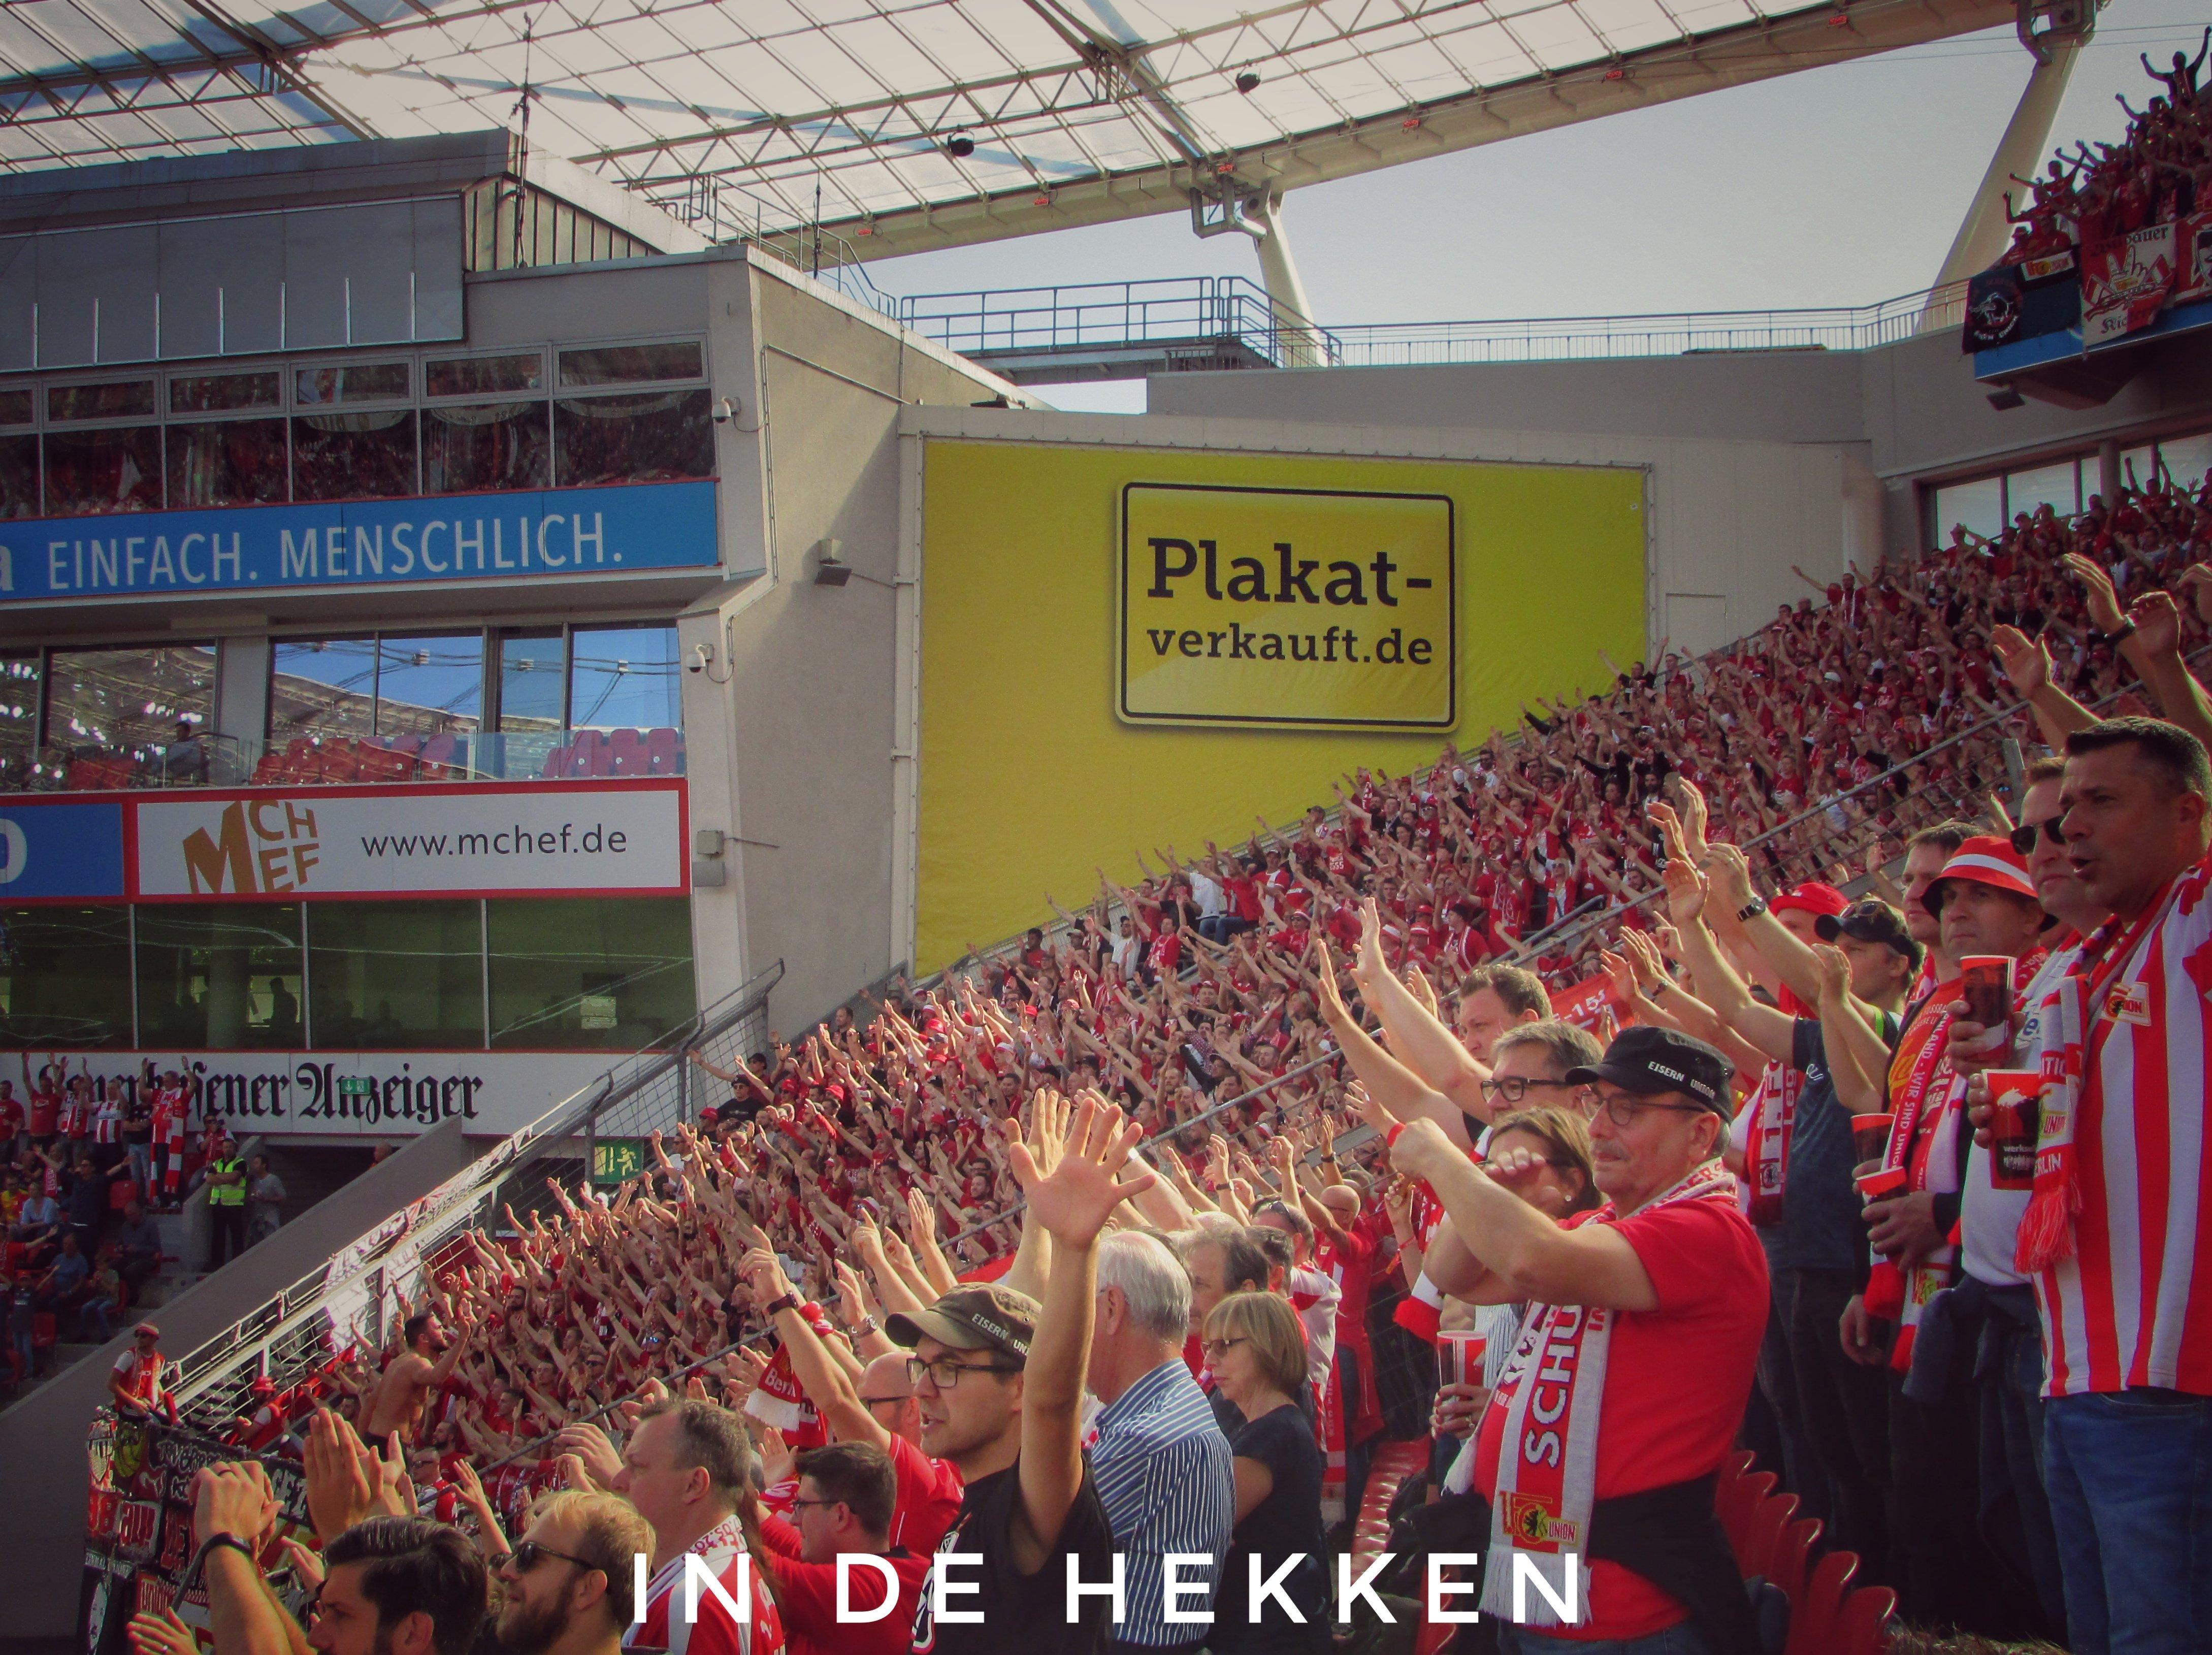 Union Berlin supporters